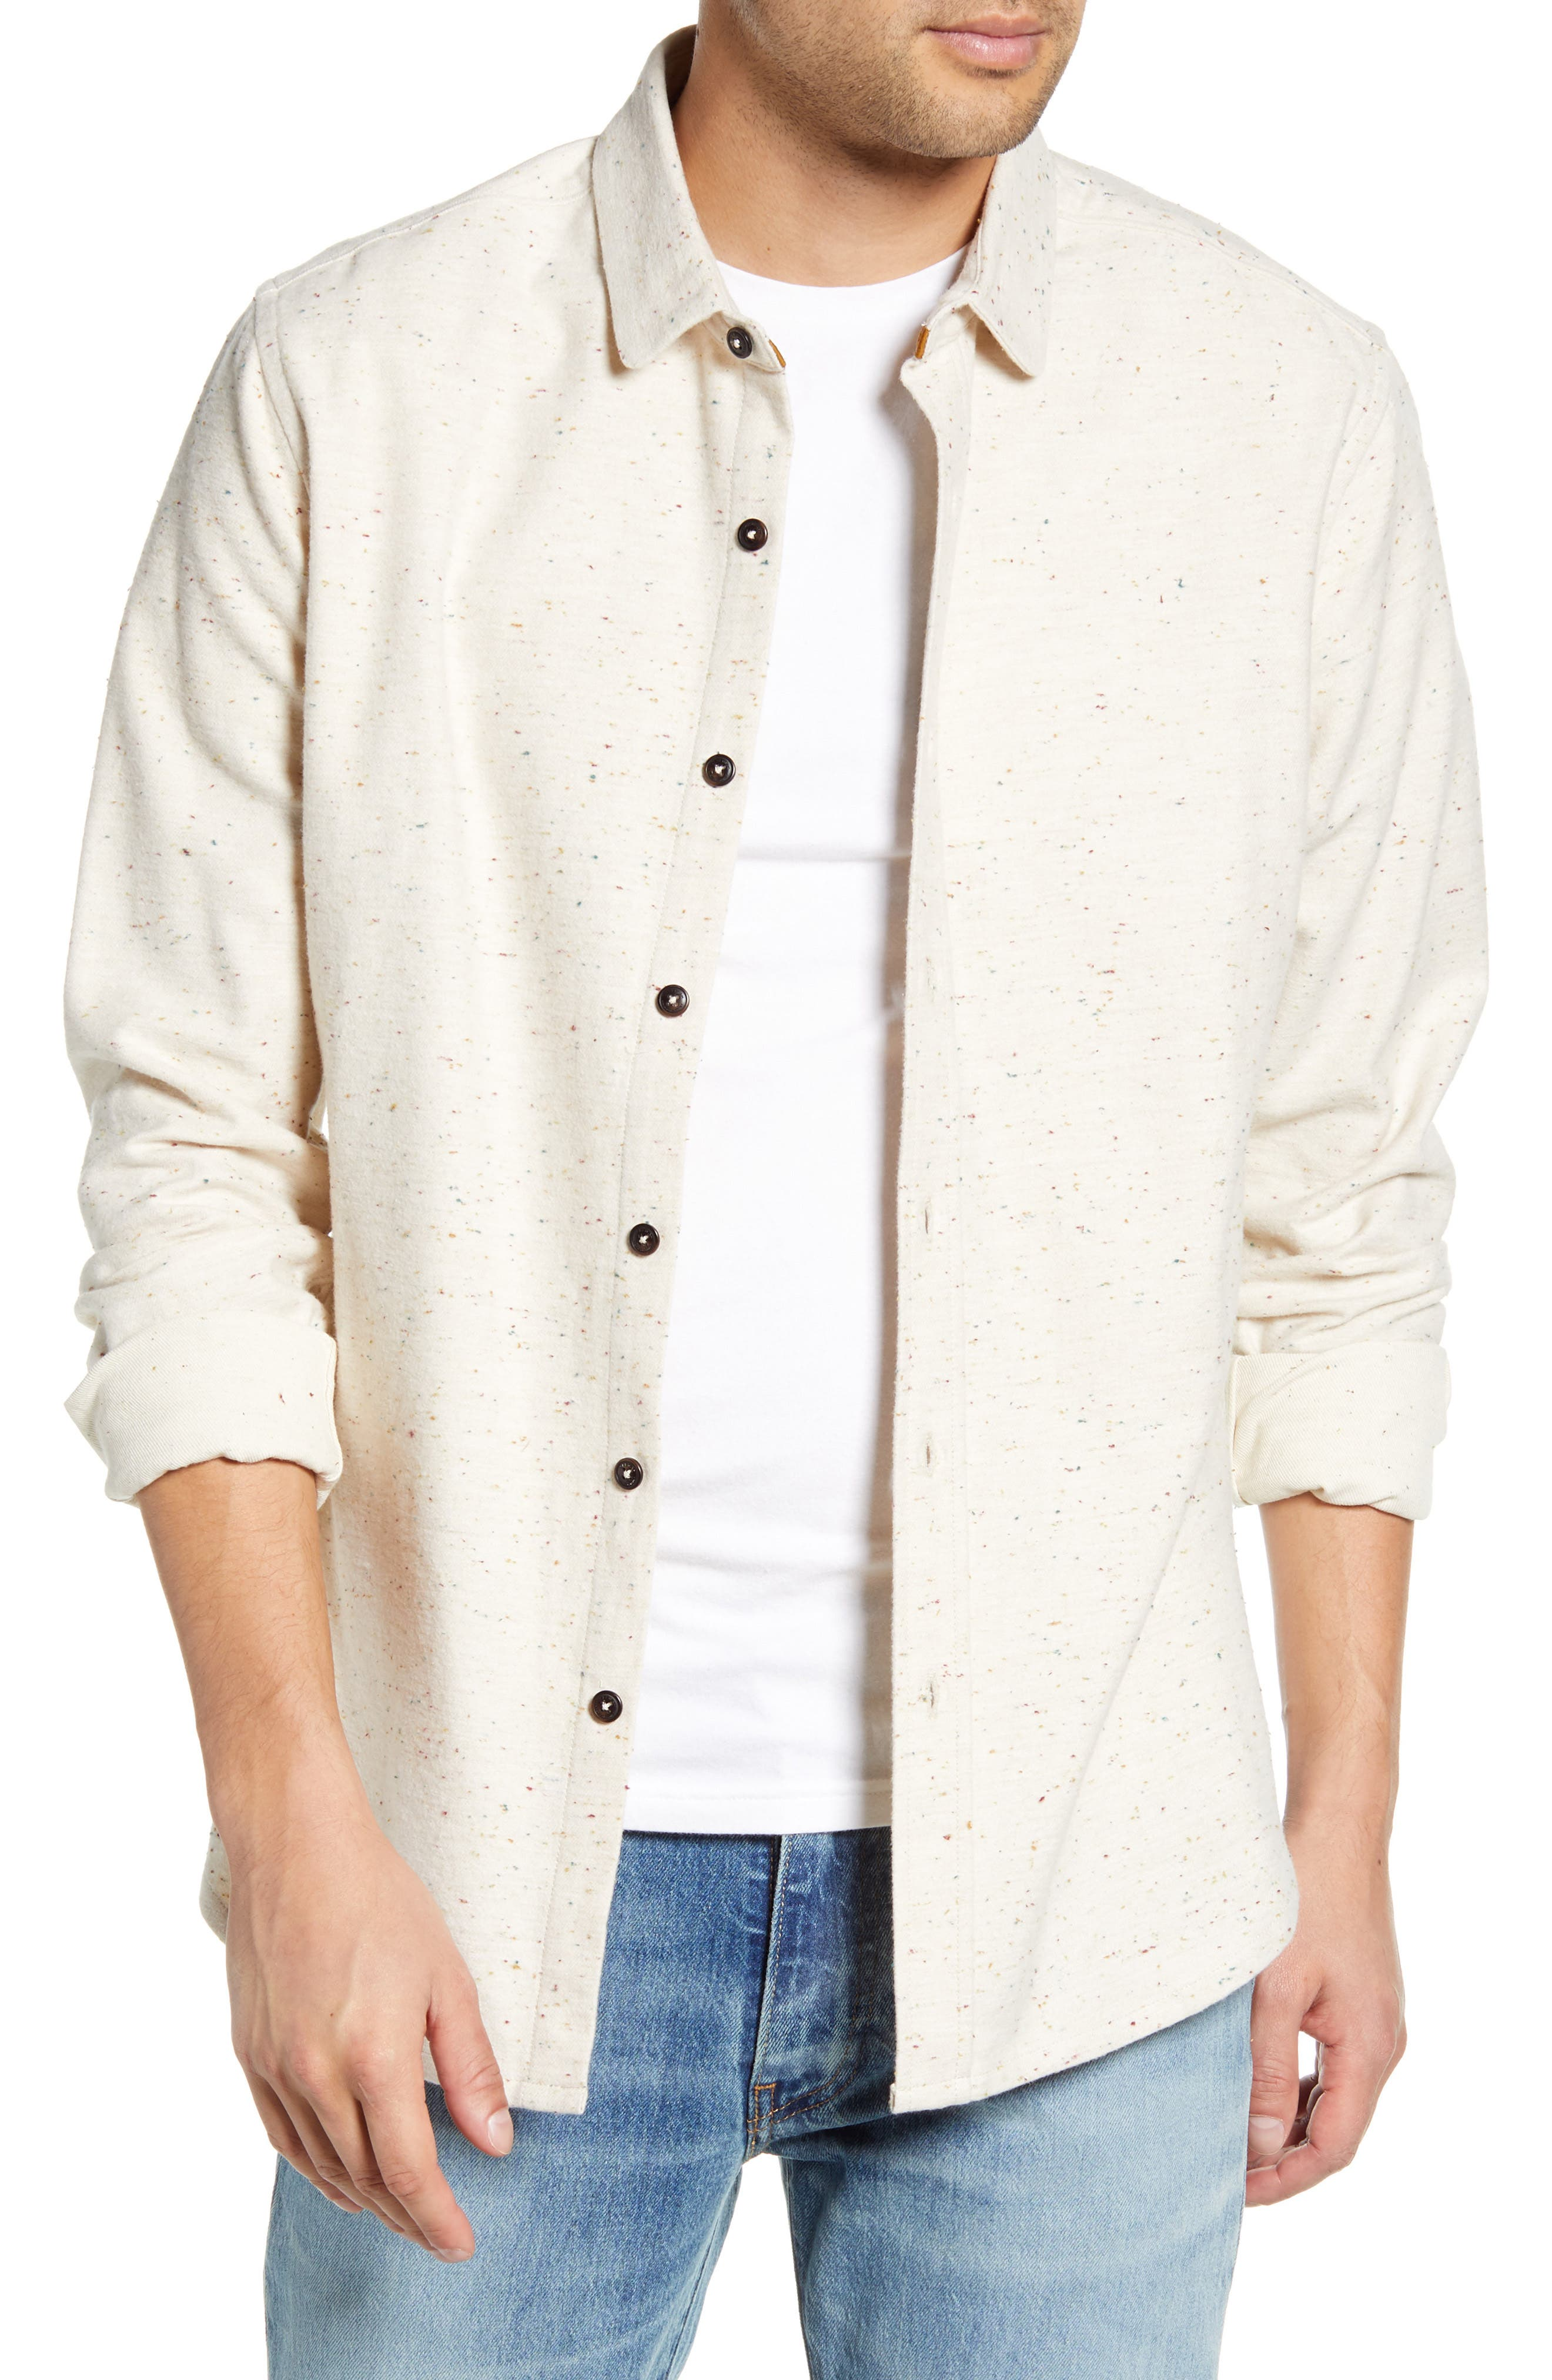 Jaxon Regular Fit Button-Up Neppy Flannel Shirt